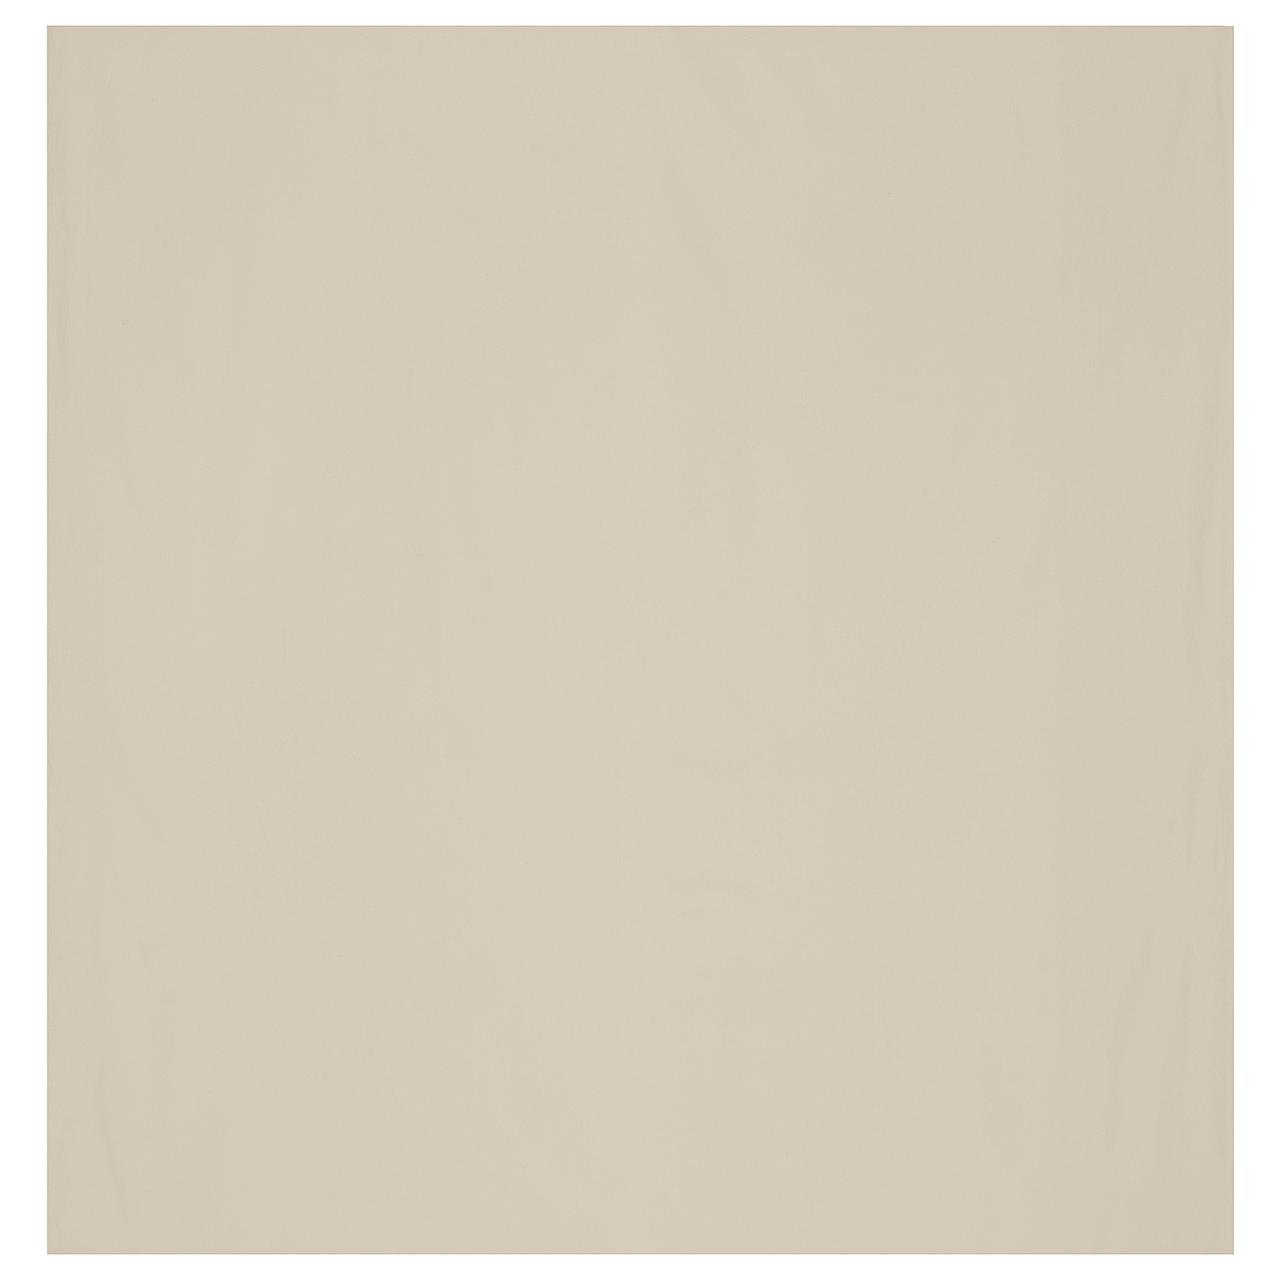 IKEA Ткань BOMULL (ИКЕА БОМУЛЬ) 517.251.12